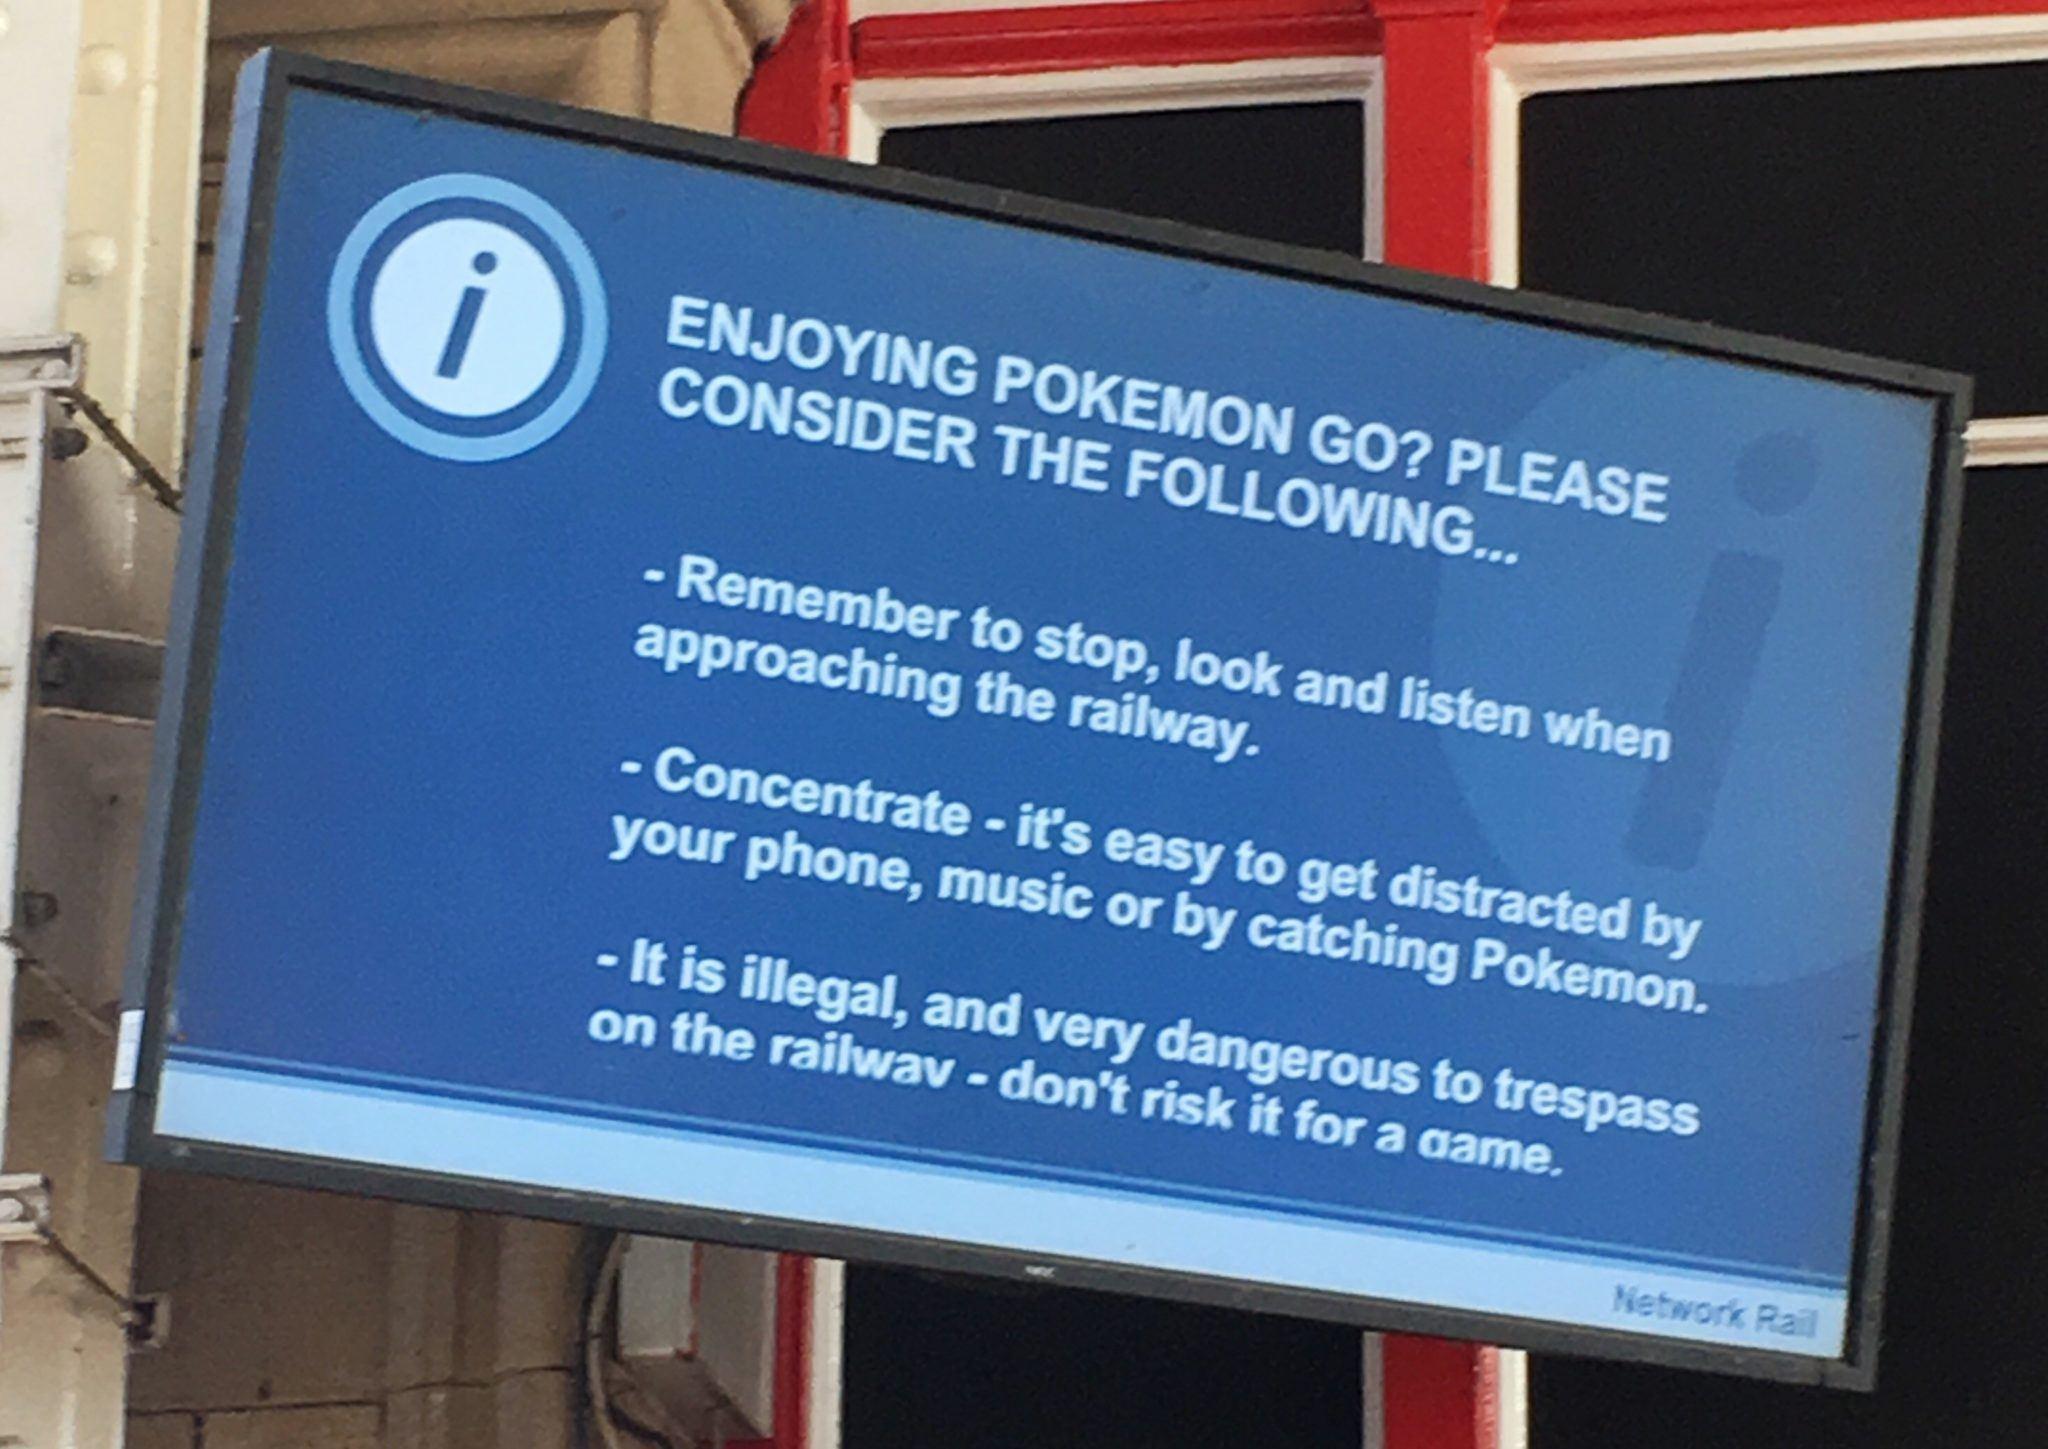 Warning! PokemonGO